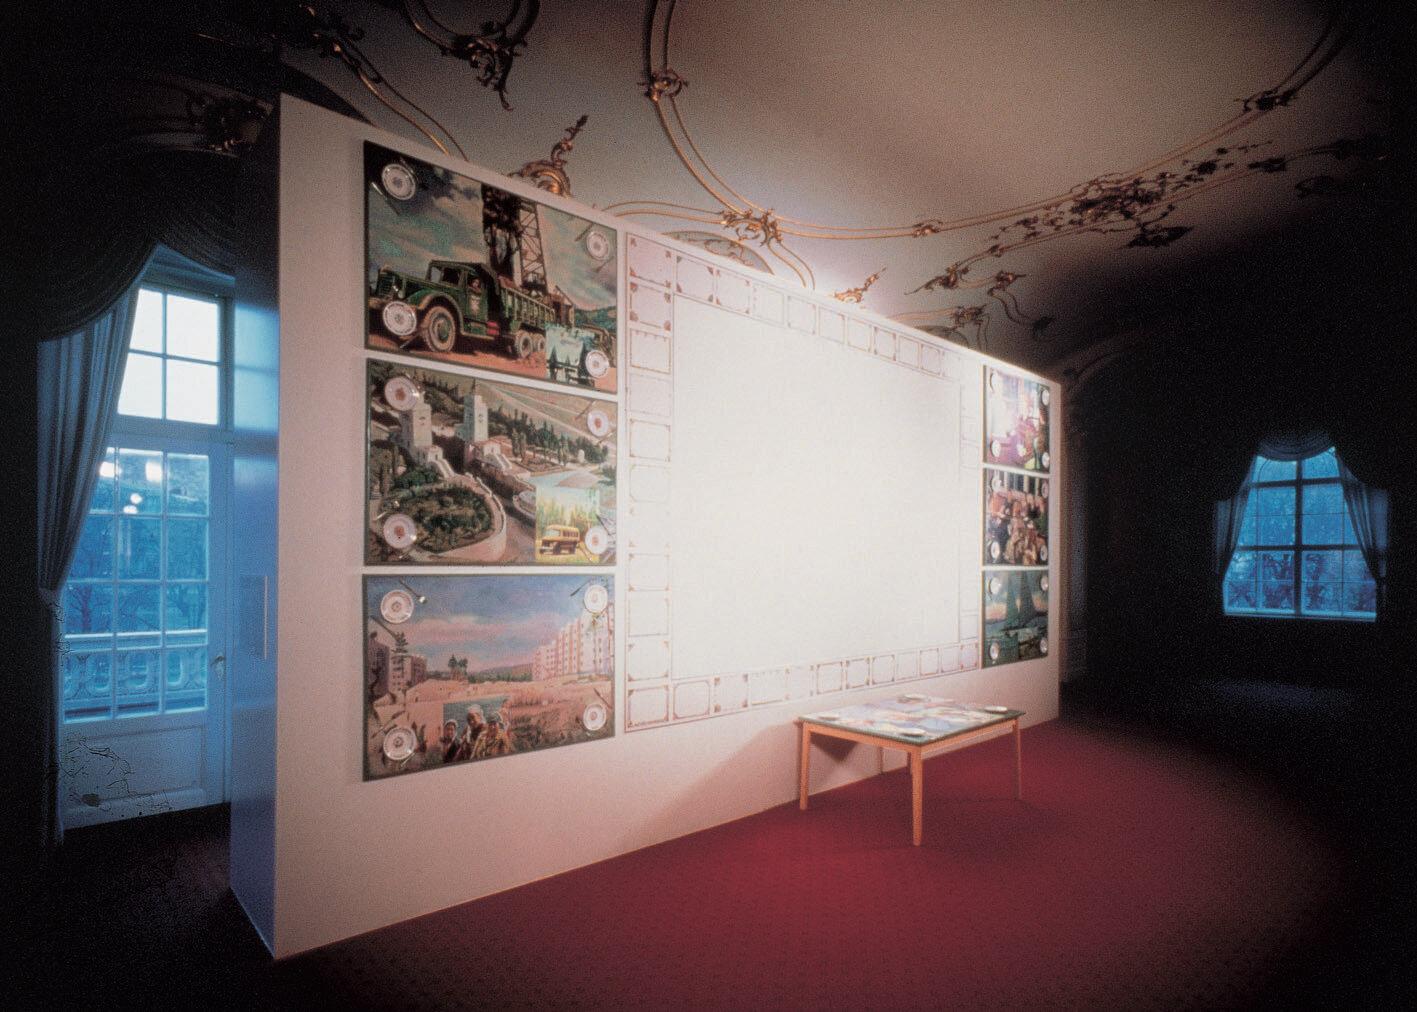 View-of-installation-foyer-of-the-Grazer-Opernhaus-Graz-1988-Photo-by-Michael-Schuster.jpg